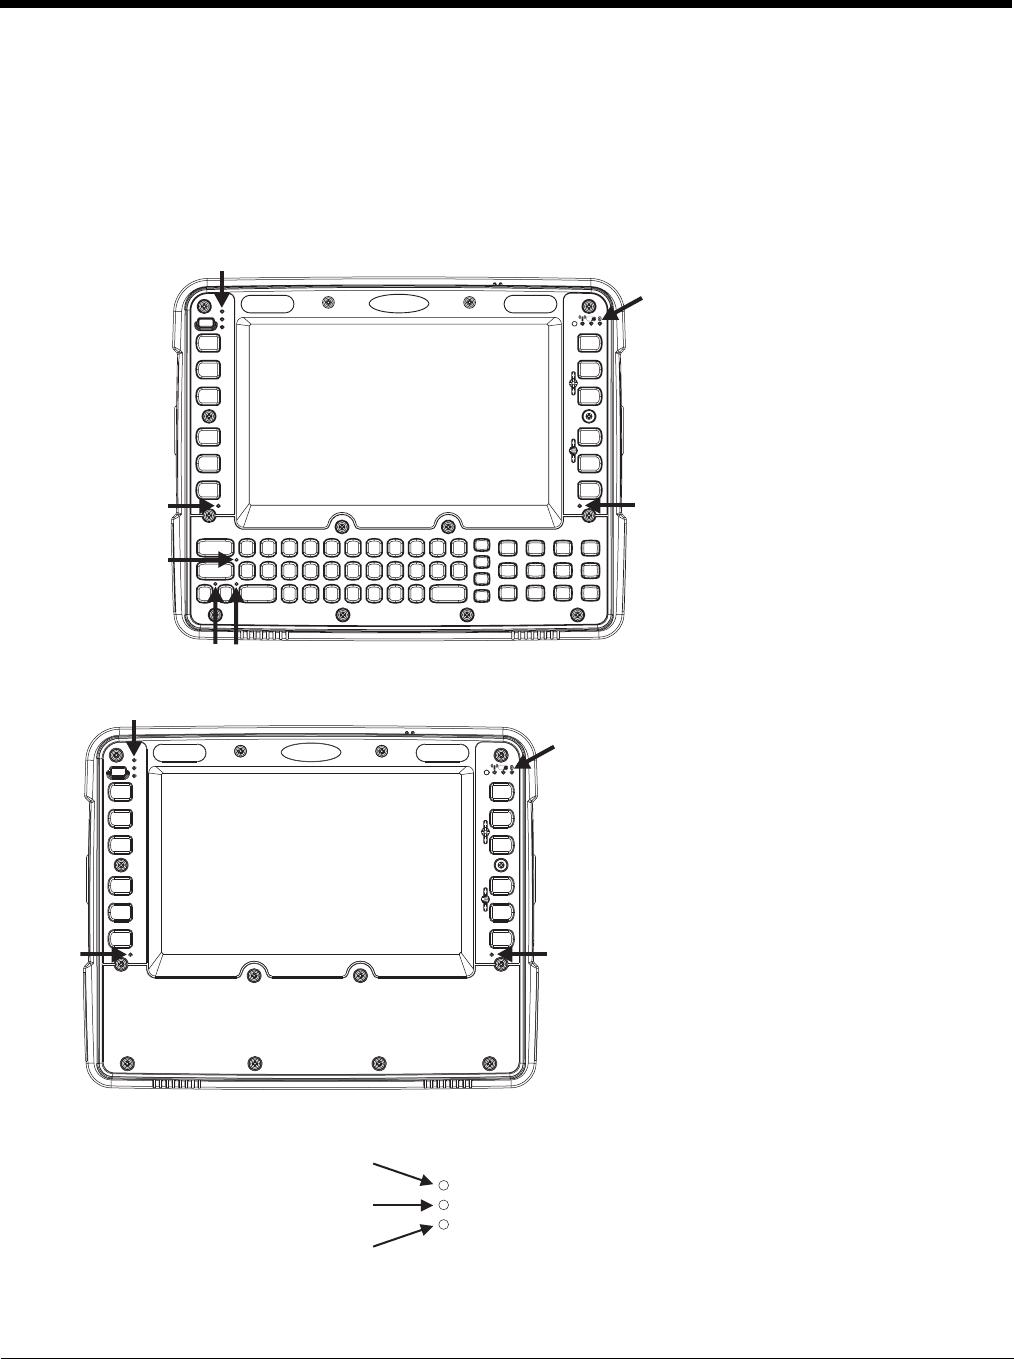 Honeywell Thor VM1 User's Guide (Windows CE) User Manual